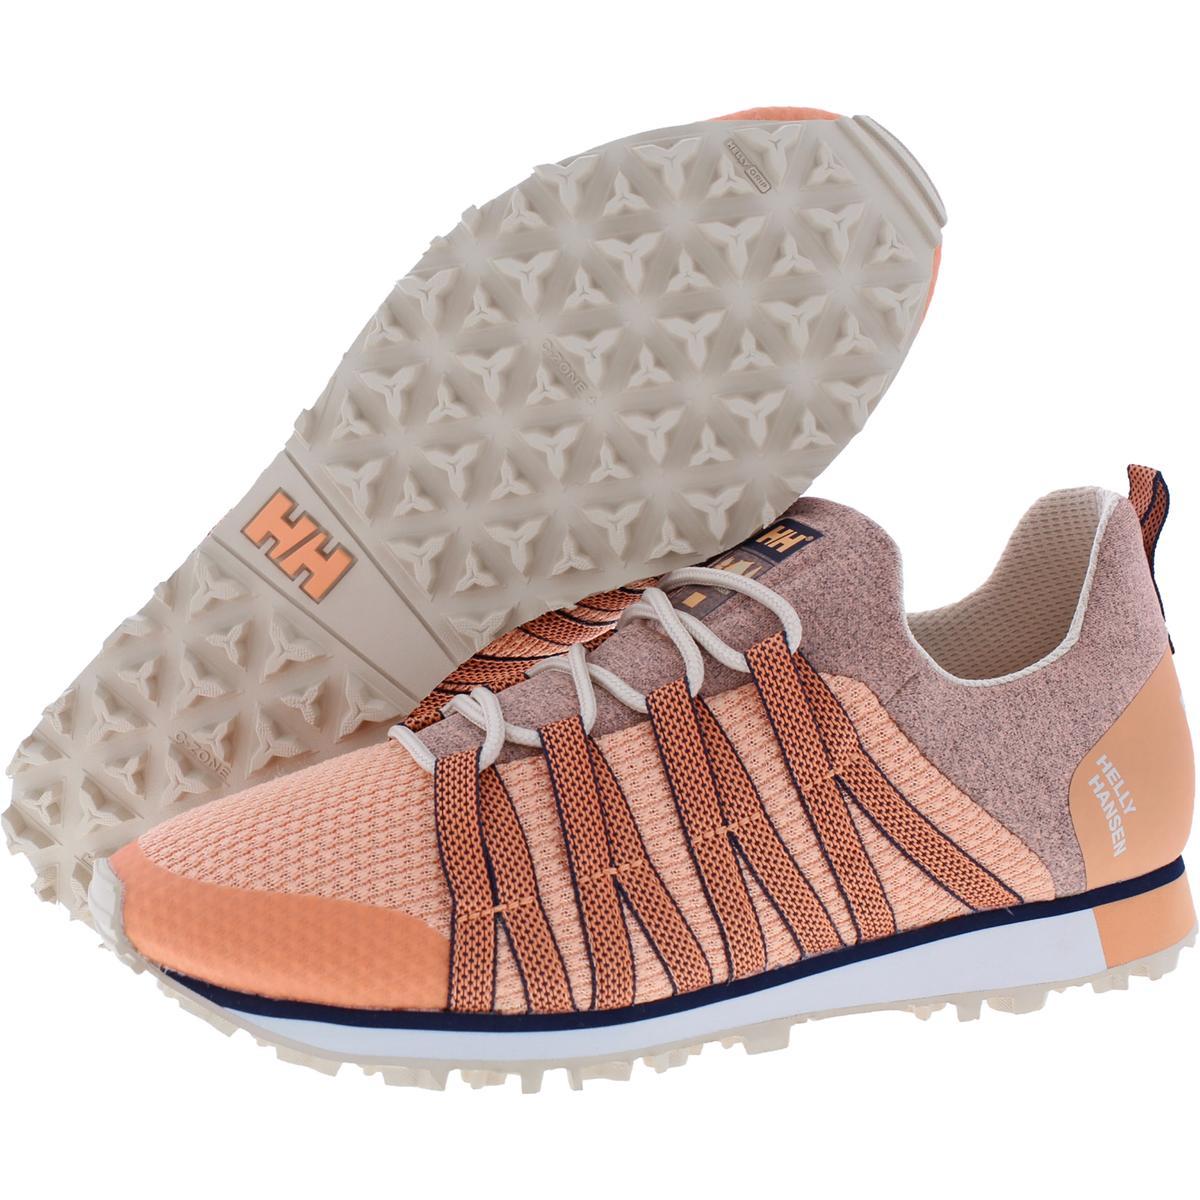 thumbnail 11 - Helly Hansen Womens Vardapeak V2 Fitness Performance Sneakers Shoes BHFO 9846